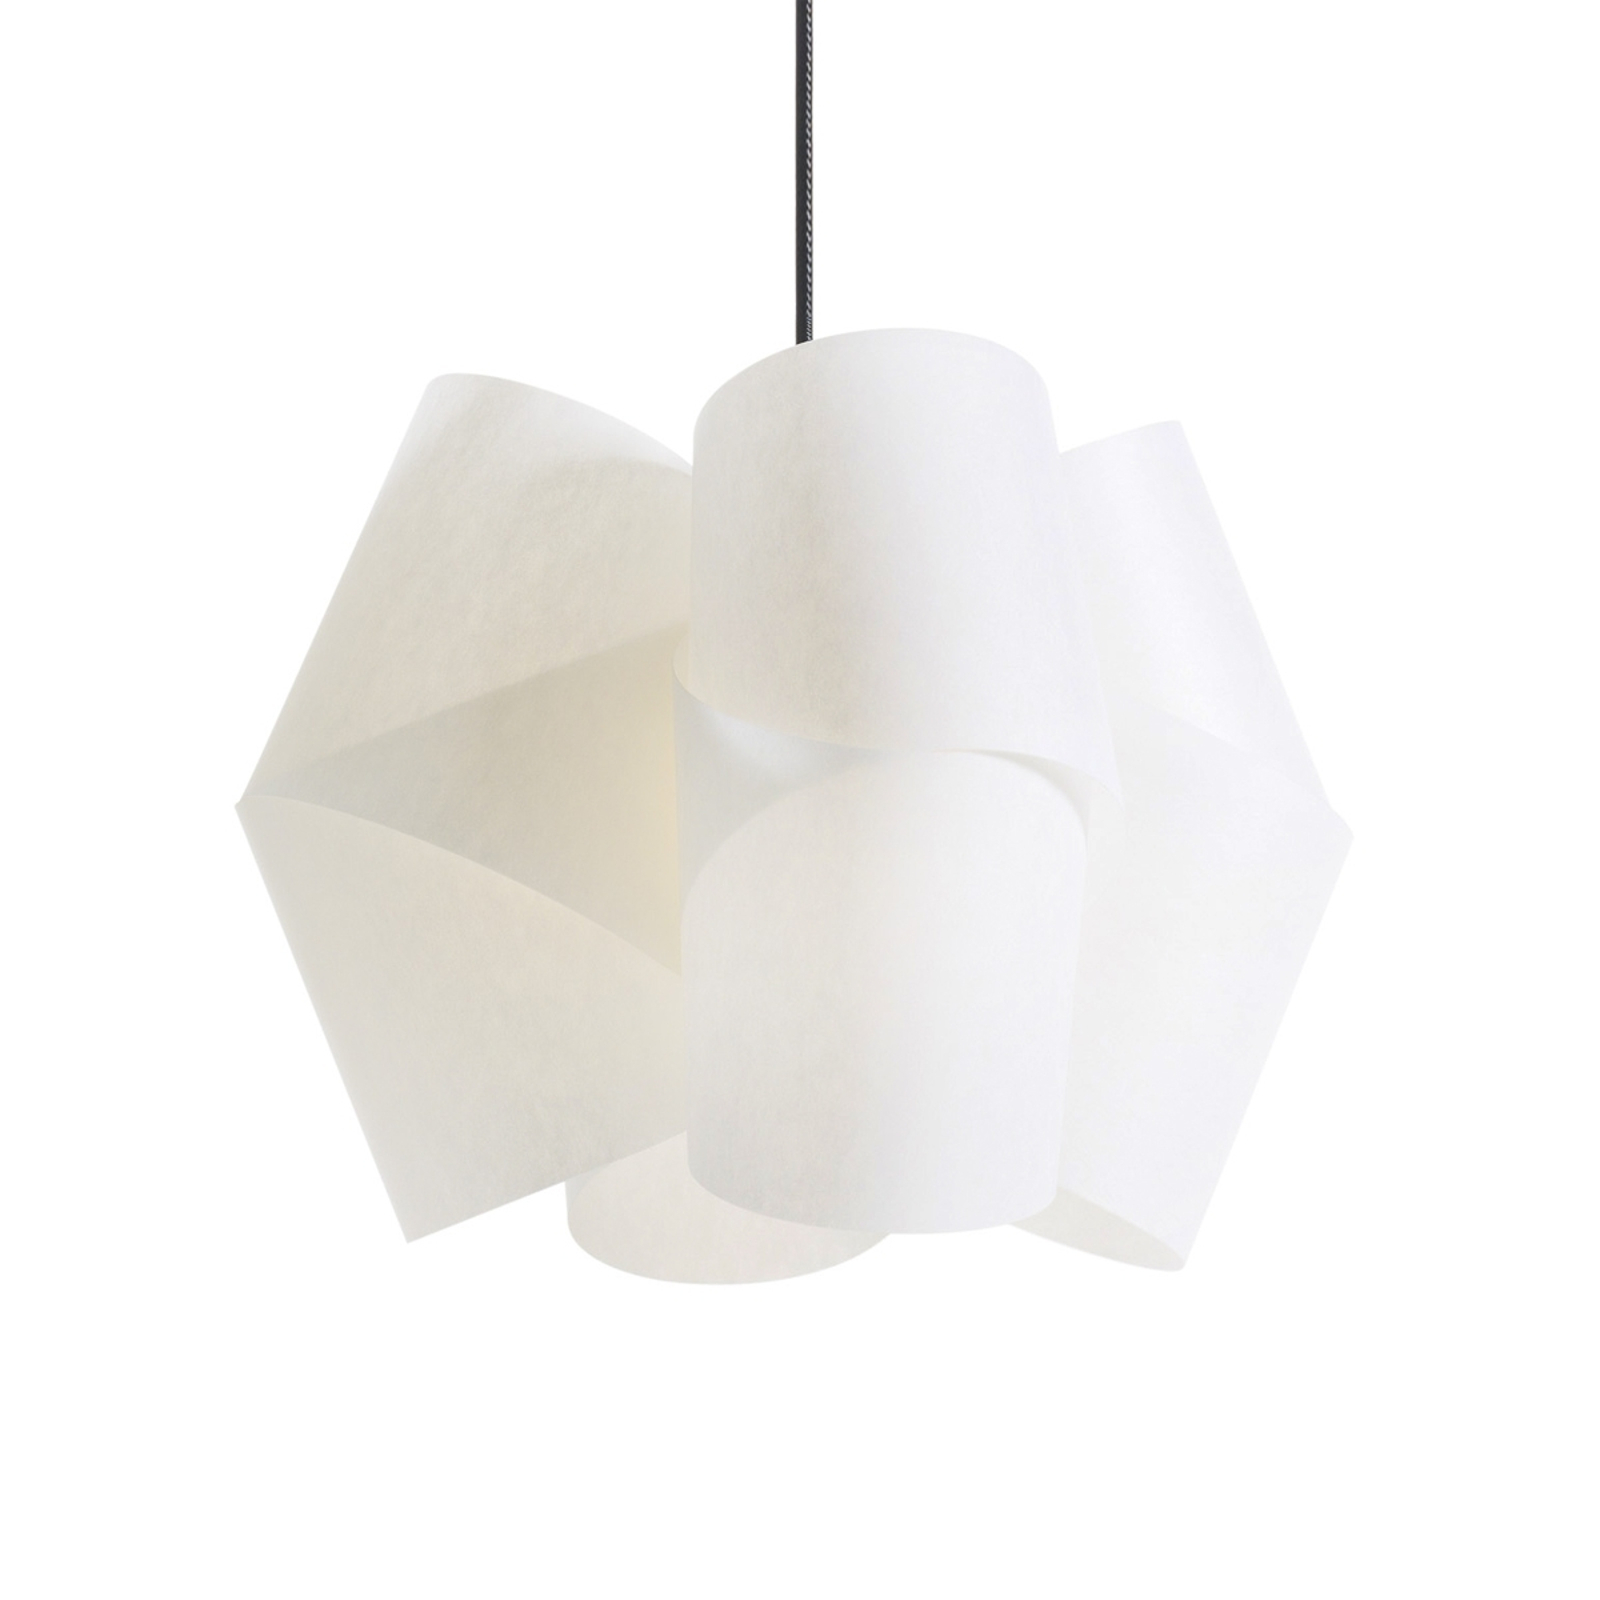 Originale lampada a sospensione Julii antracite 36